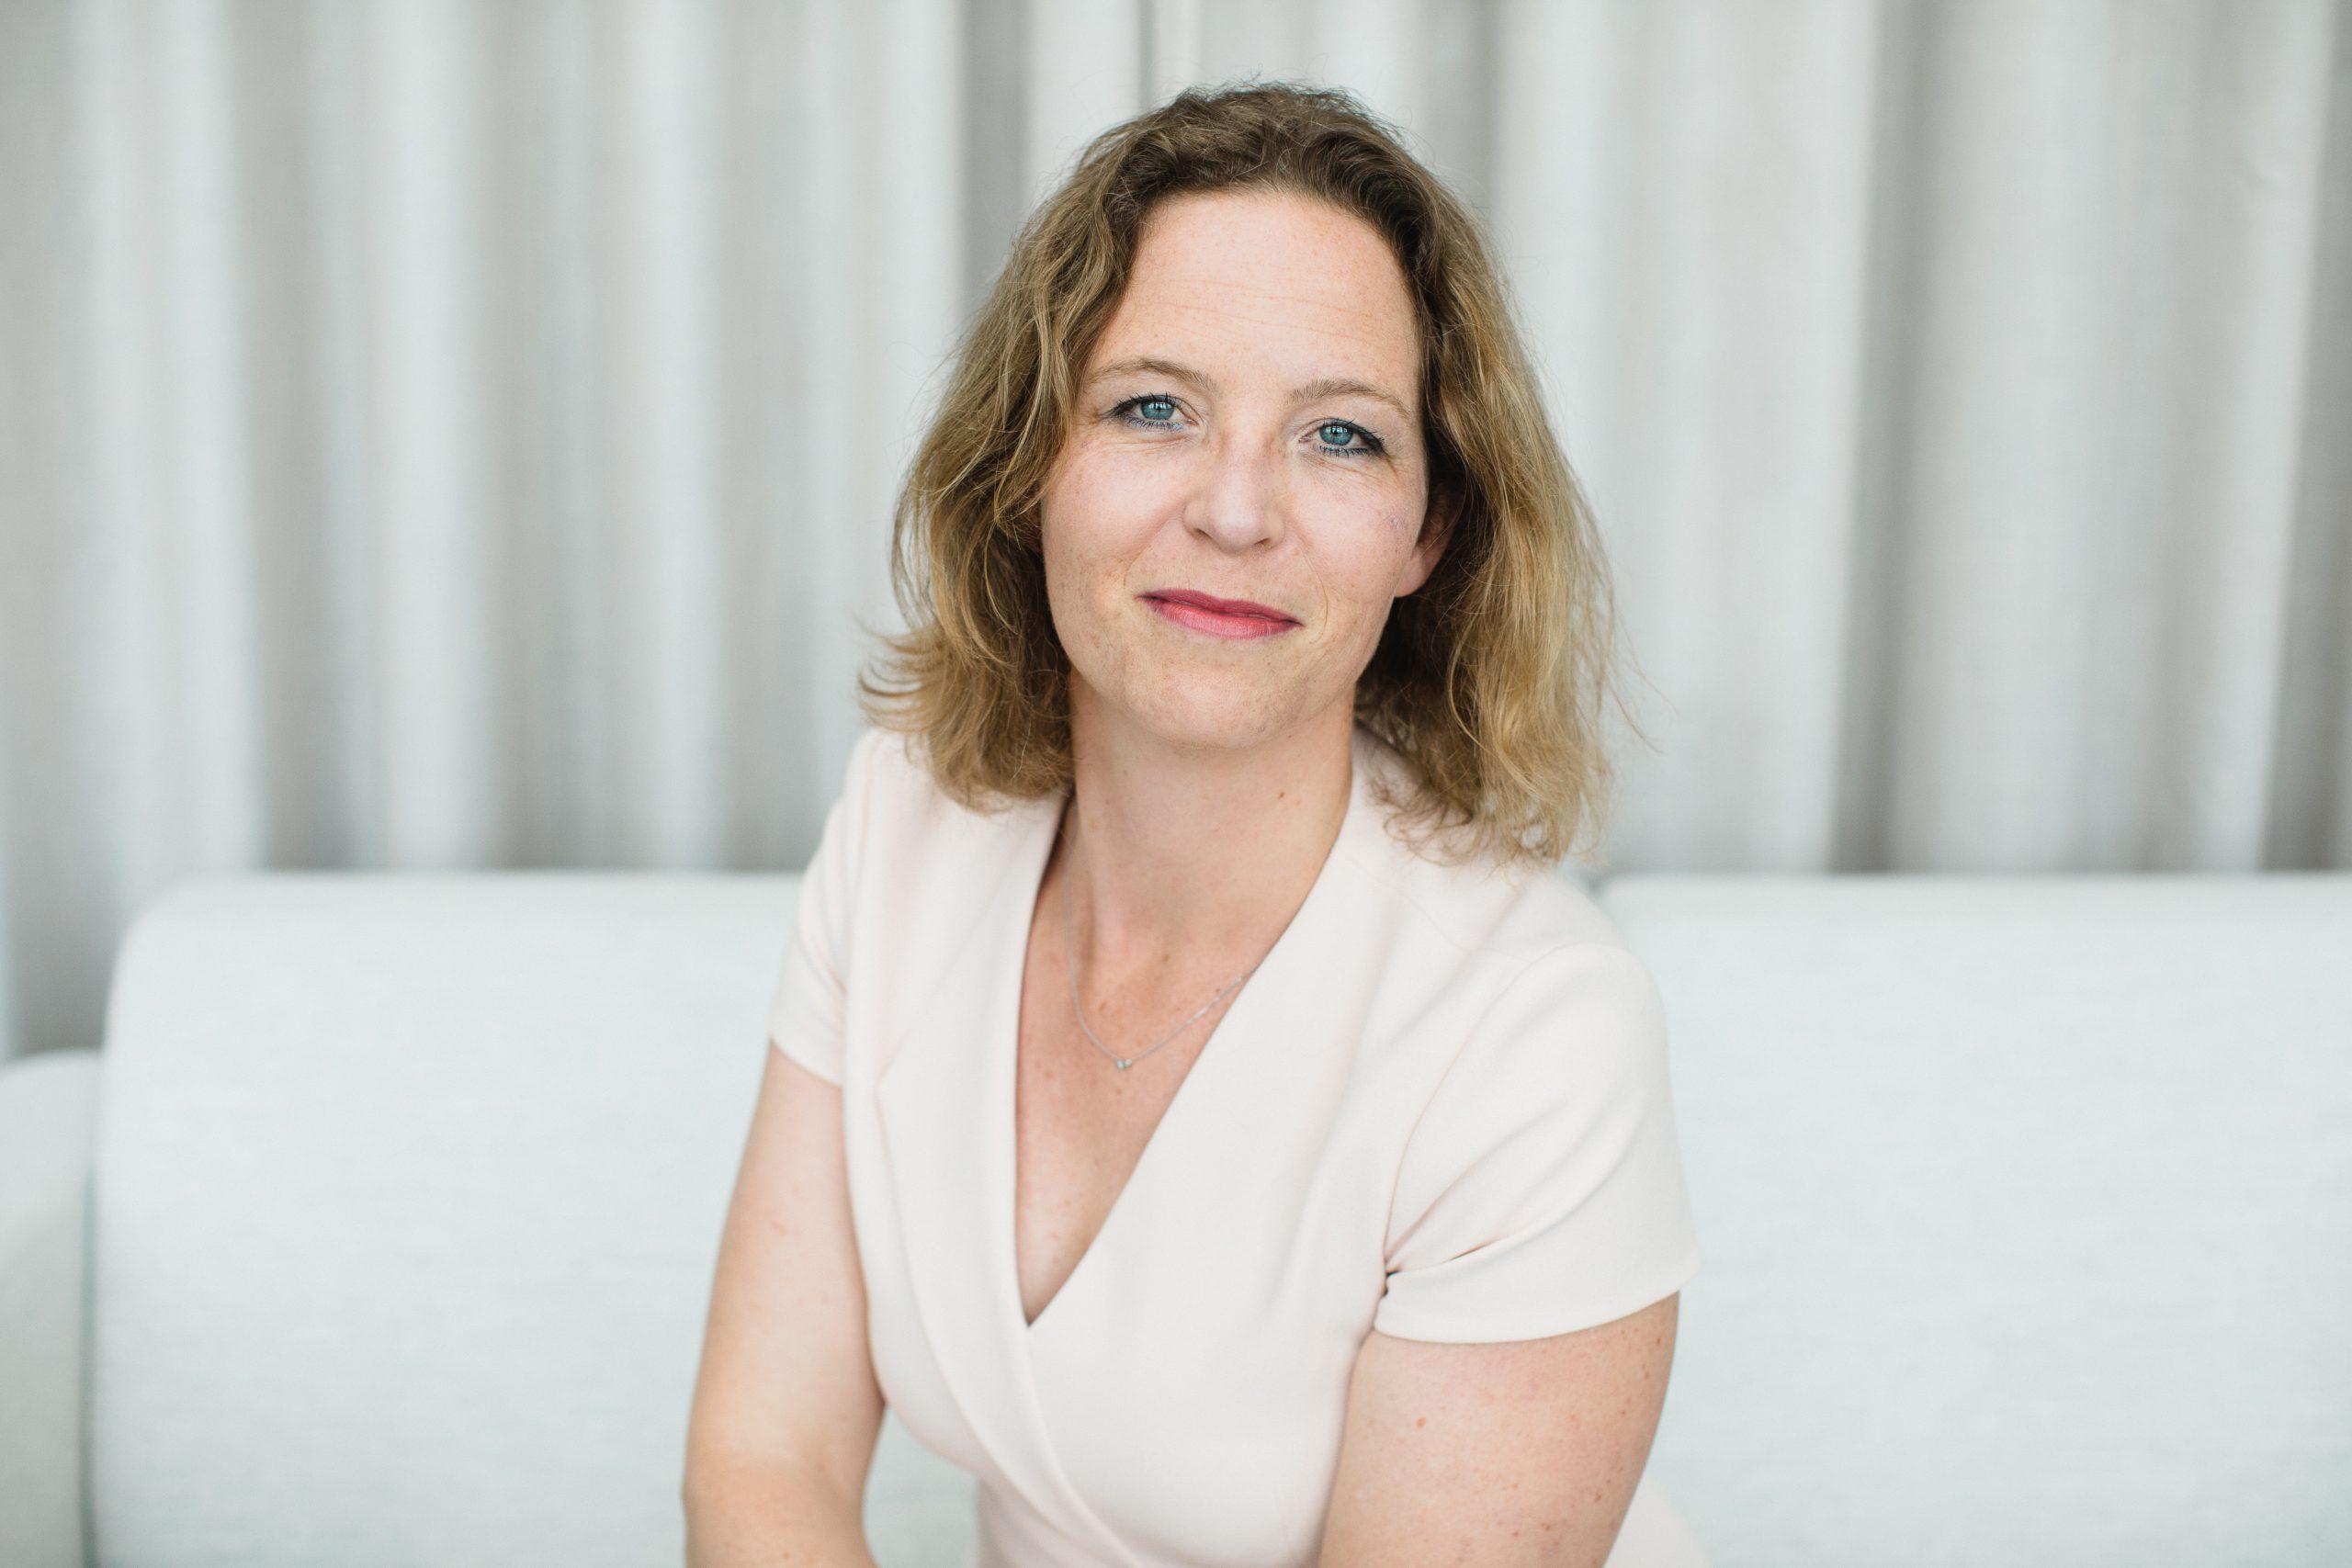 Wendy Mittemeijer-Ooteman